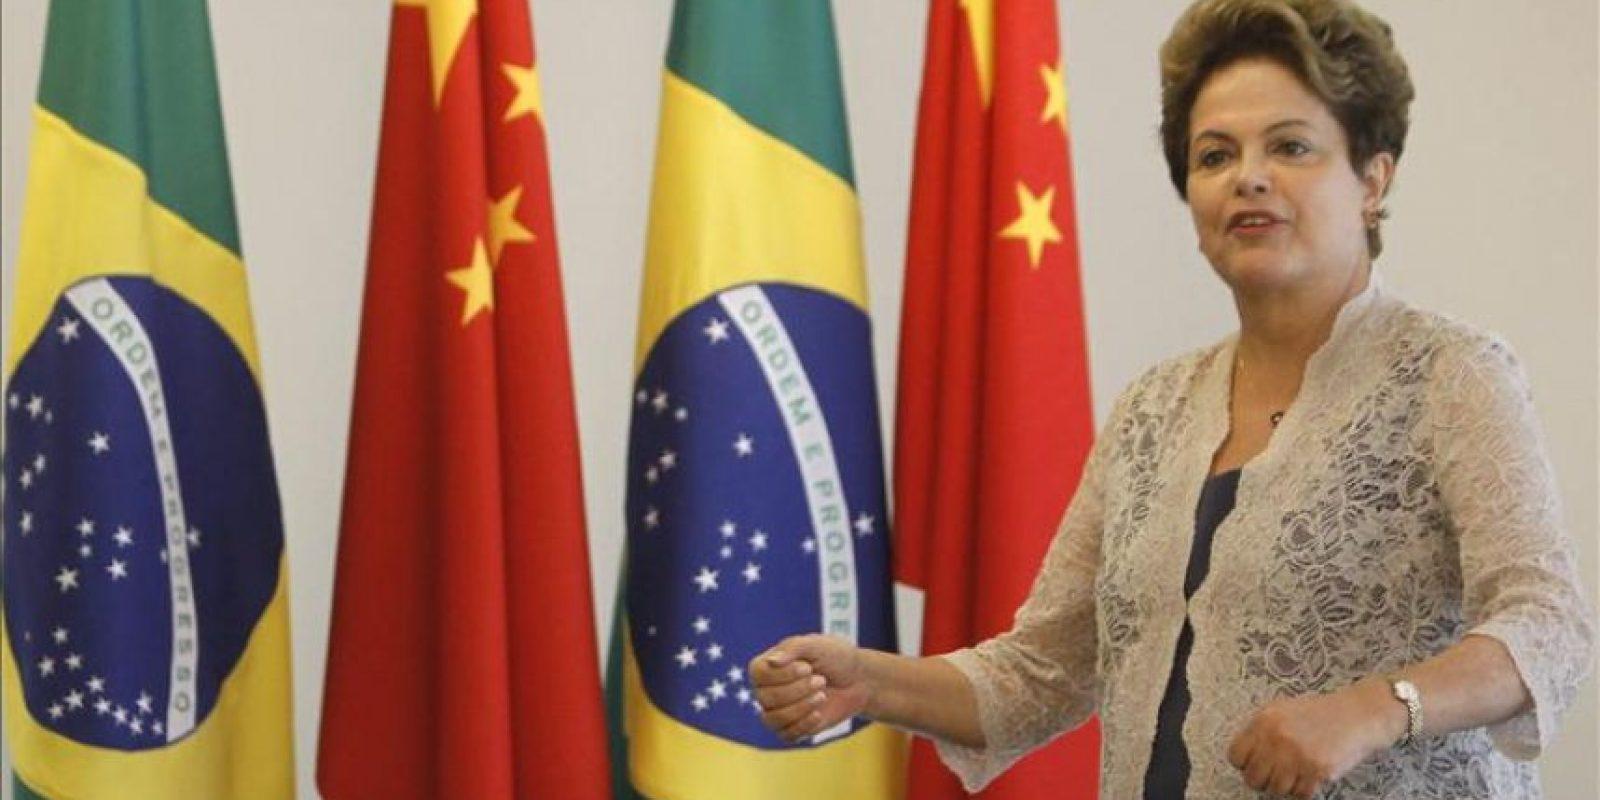 La mandataria brasileña, Dilma Rousseff. EFE/Archivo